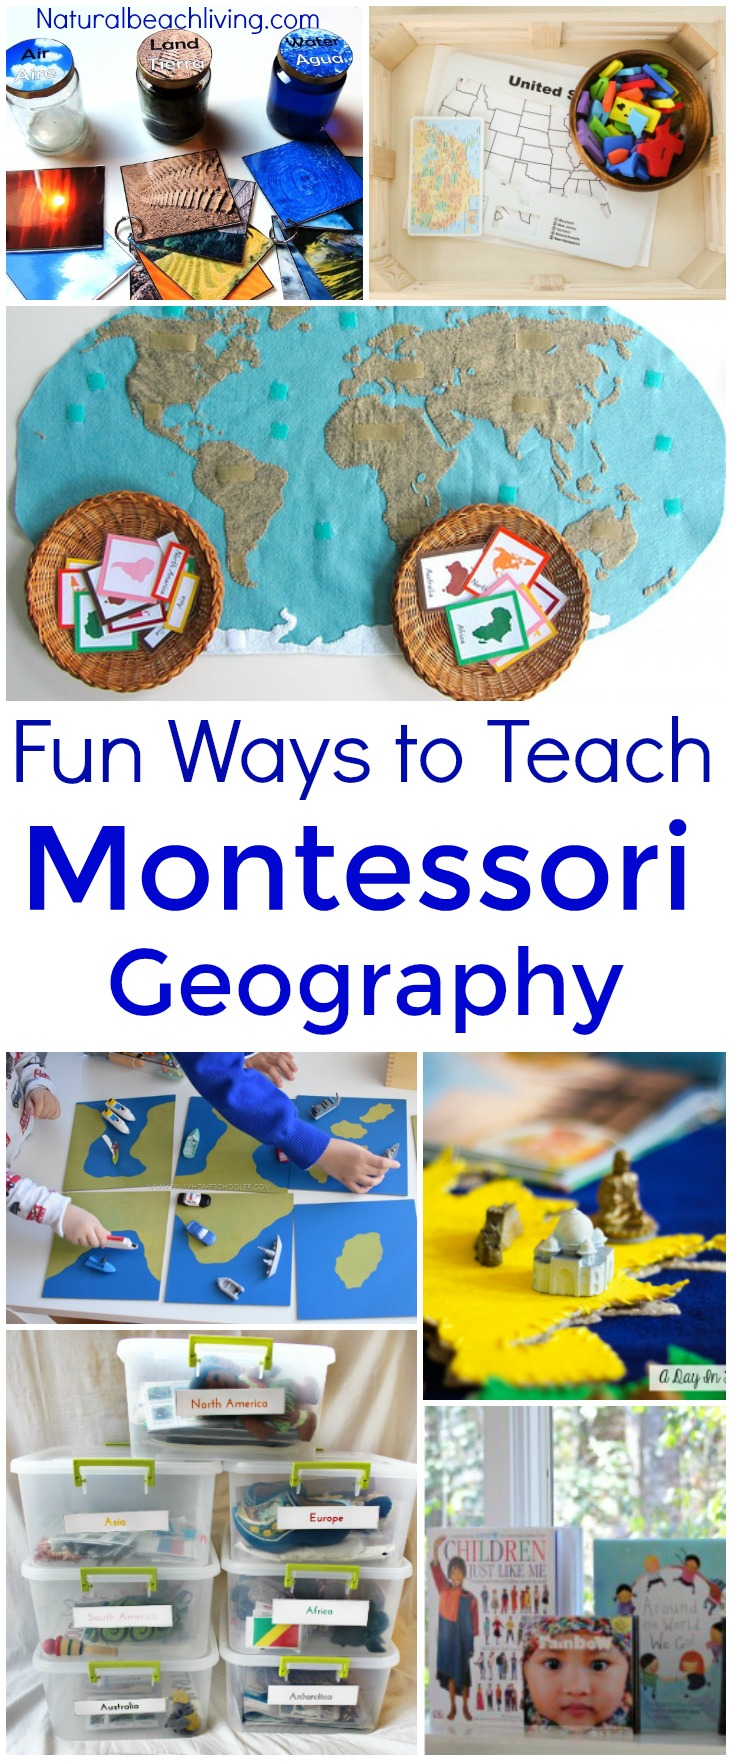 20+ Ways to Teach Montessori Geography Kids Will Love